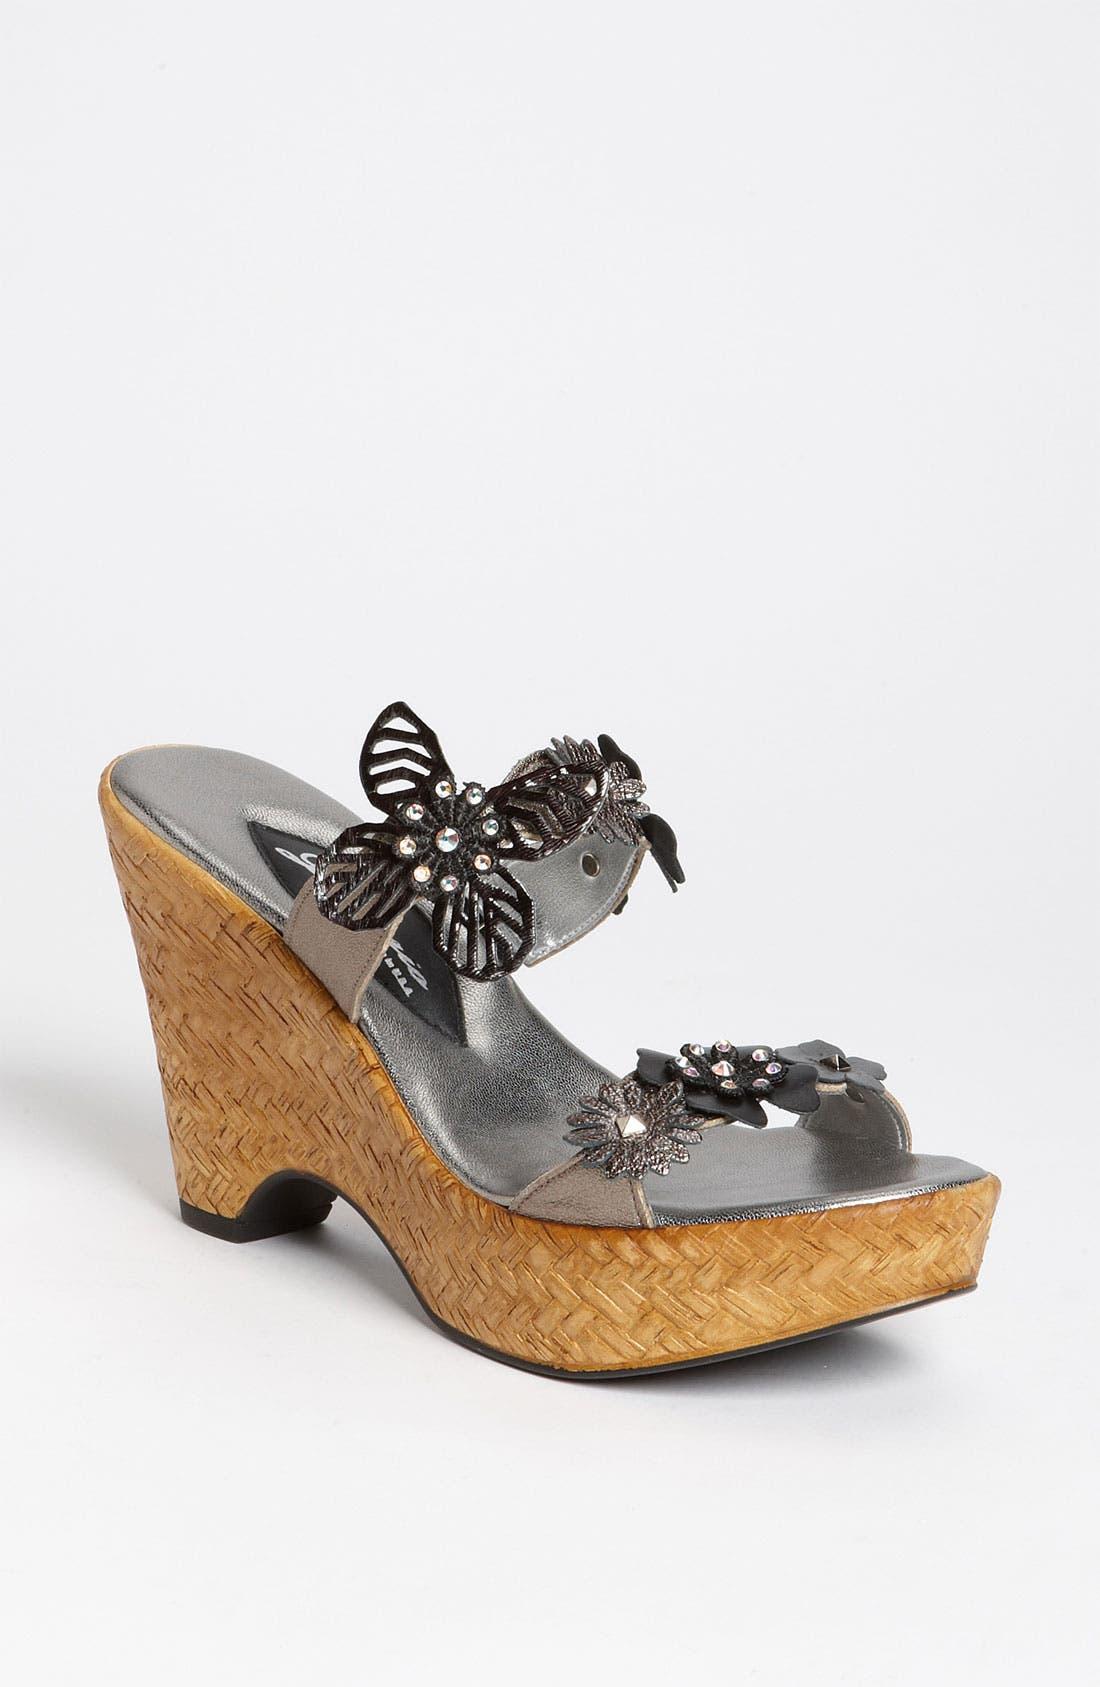 Main Image - Dezario 'Butterfly' Sandal